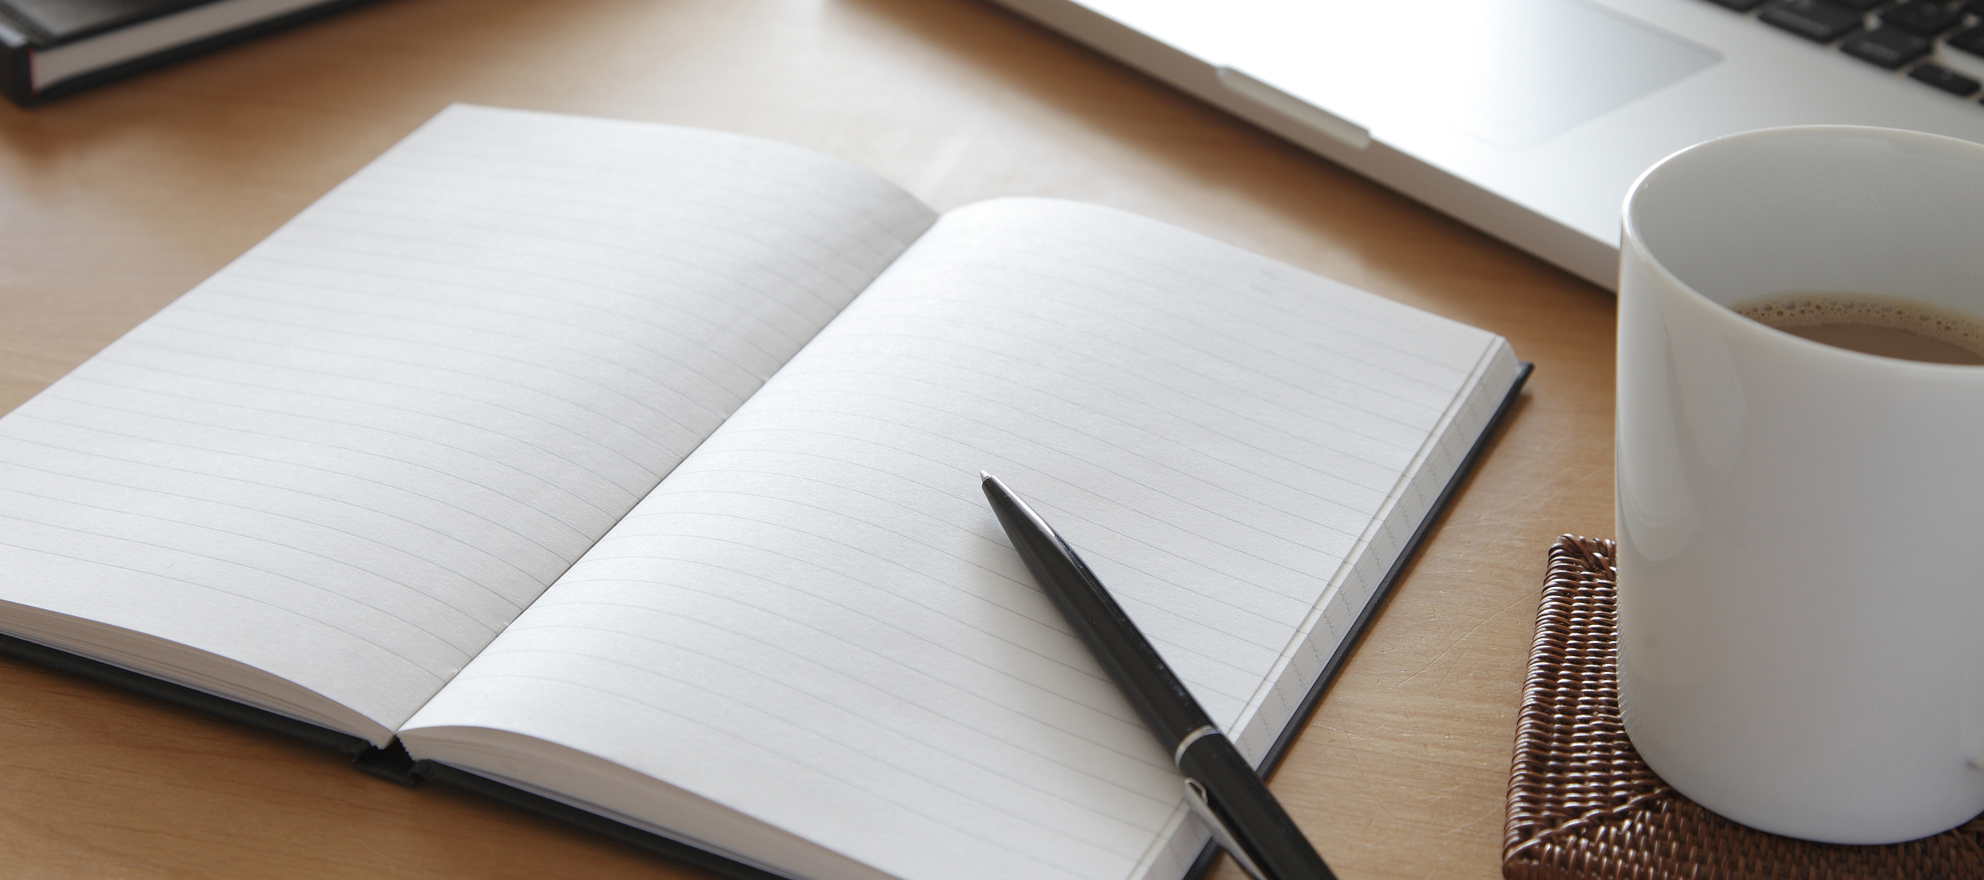 real estate bullet journal